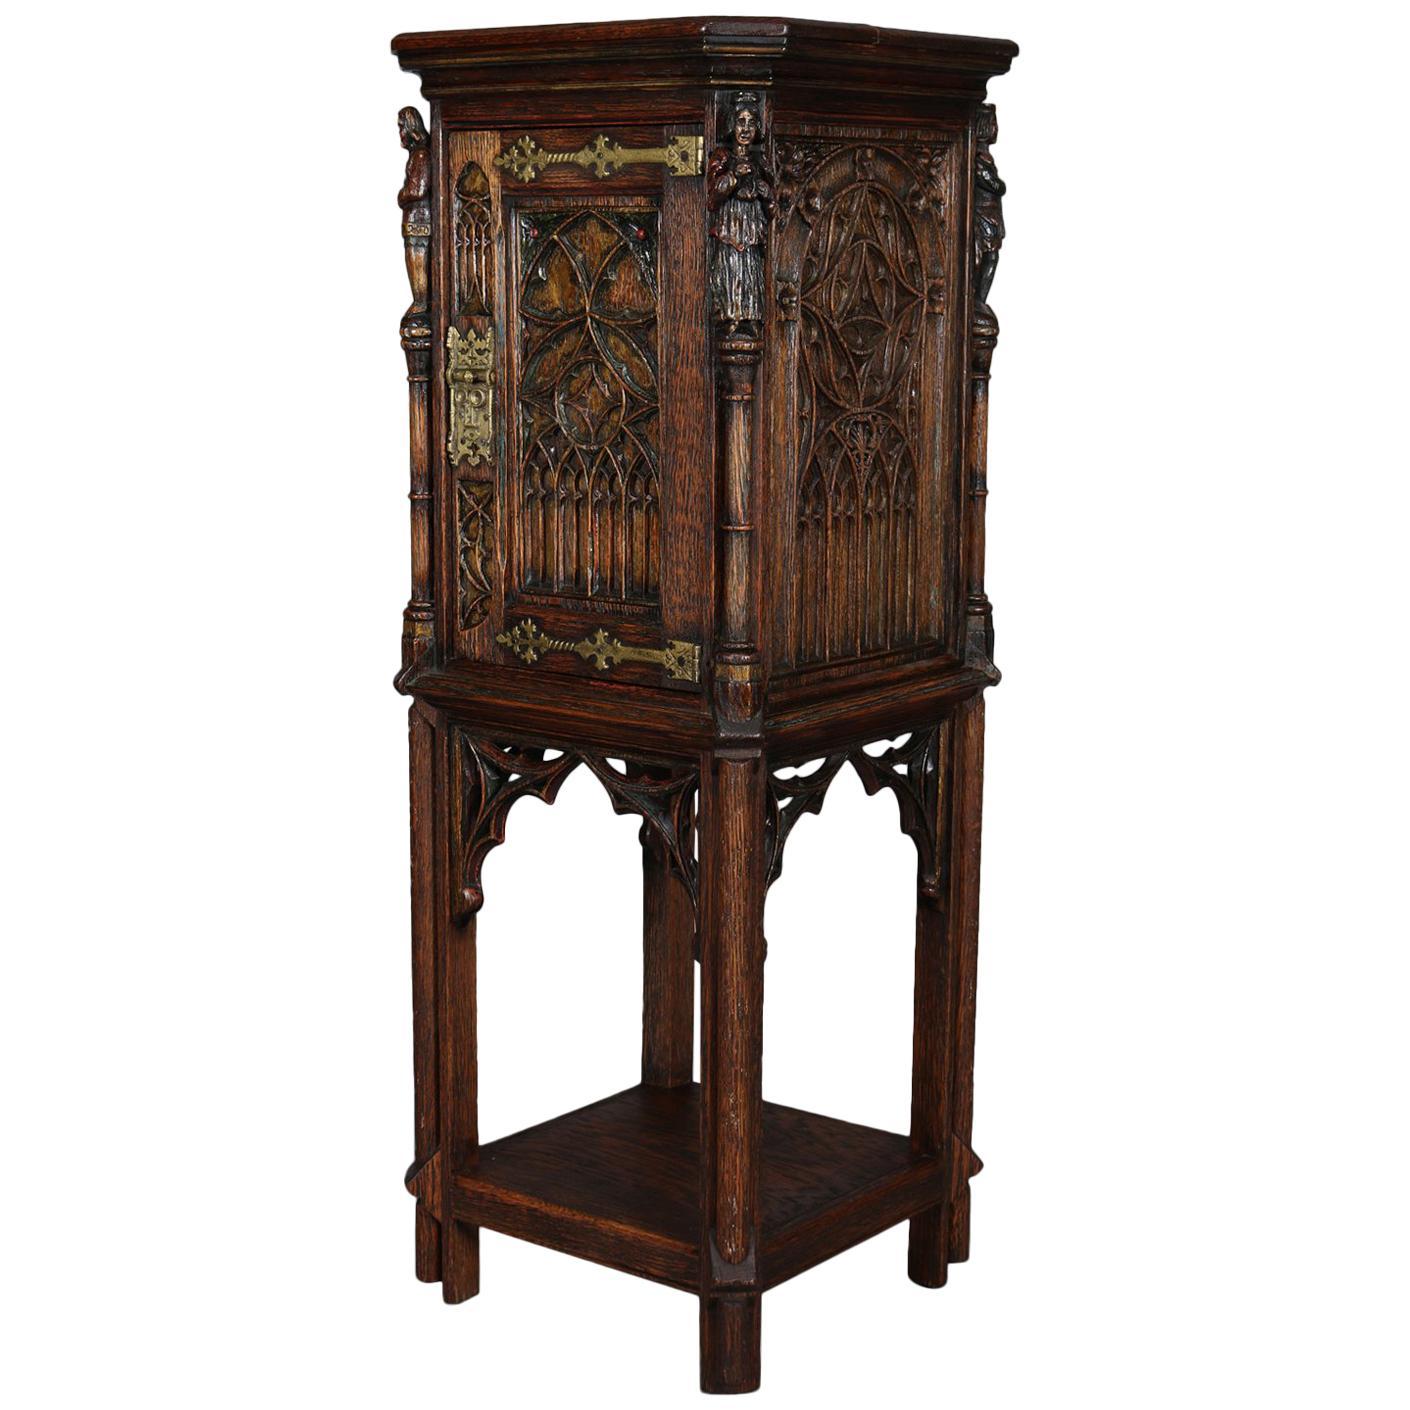 Delicieux Gothic Figural Carved Oak Polychromed And Gilt Cellarette Cabinet, Circa  1880